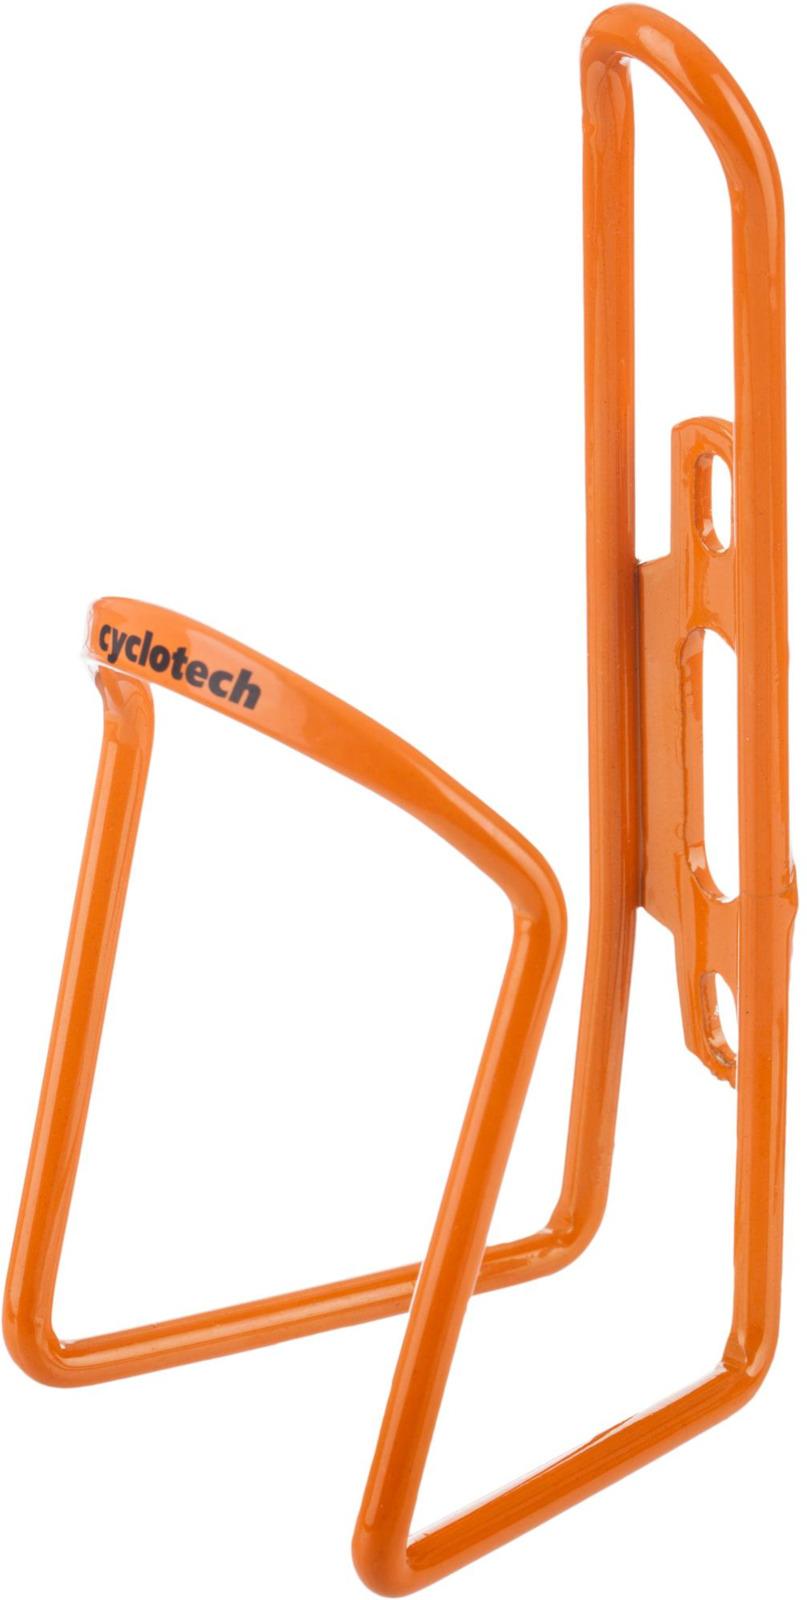 Флягодержатель Stern CBH-1B Bottle holder, оранжевый